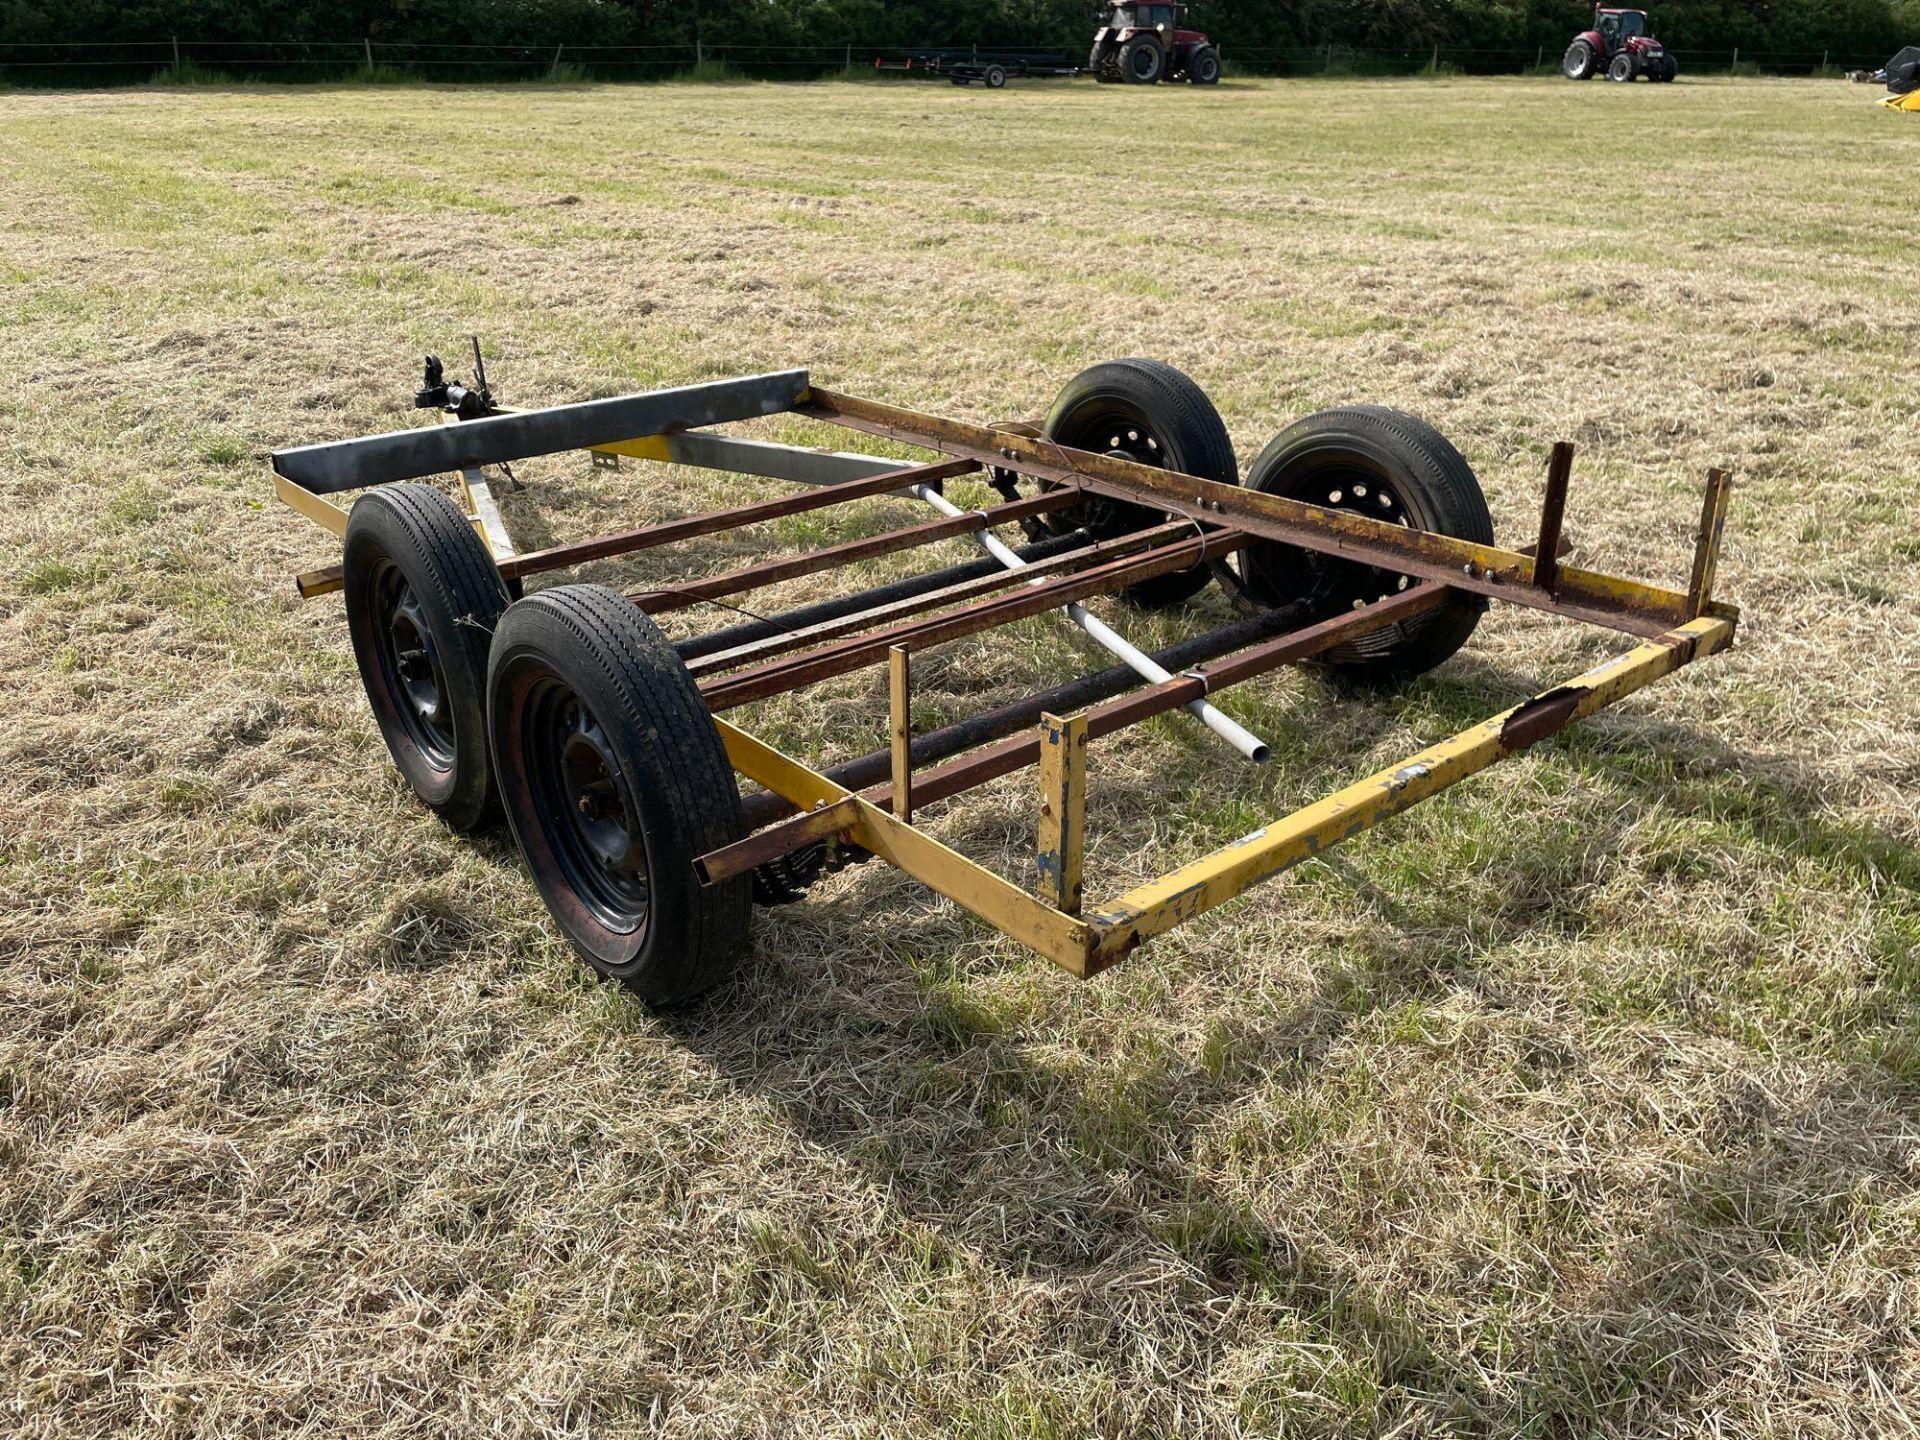 Single axle car trailer frame - Image 3 of 4